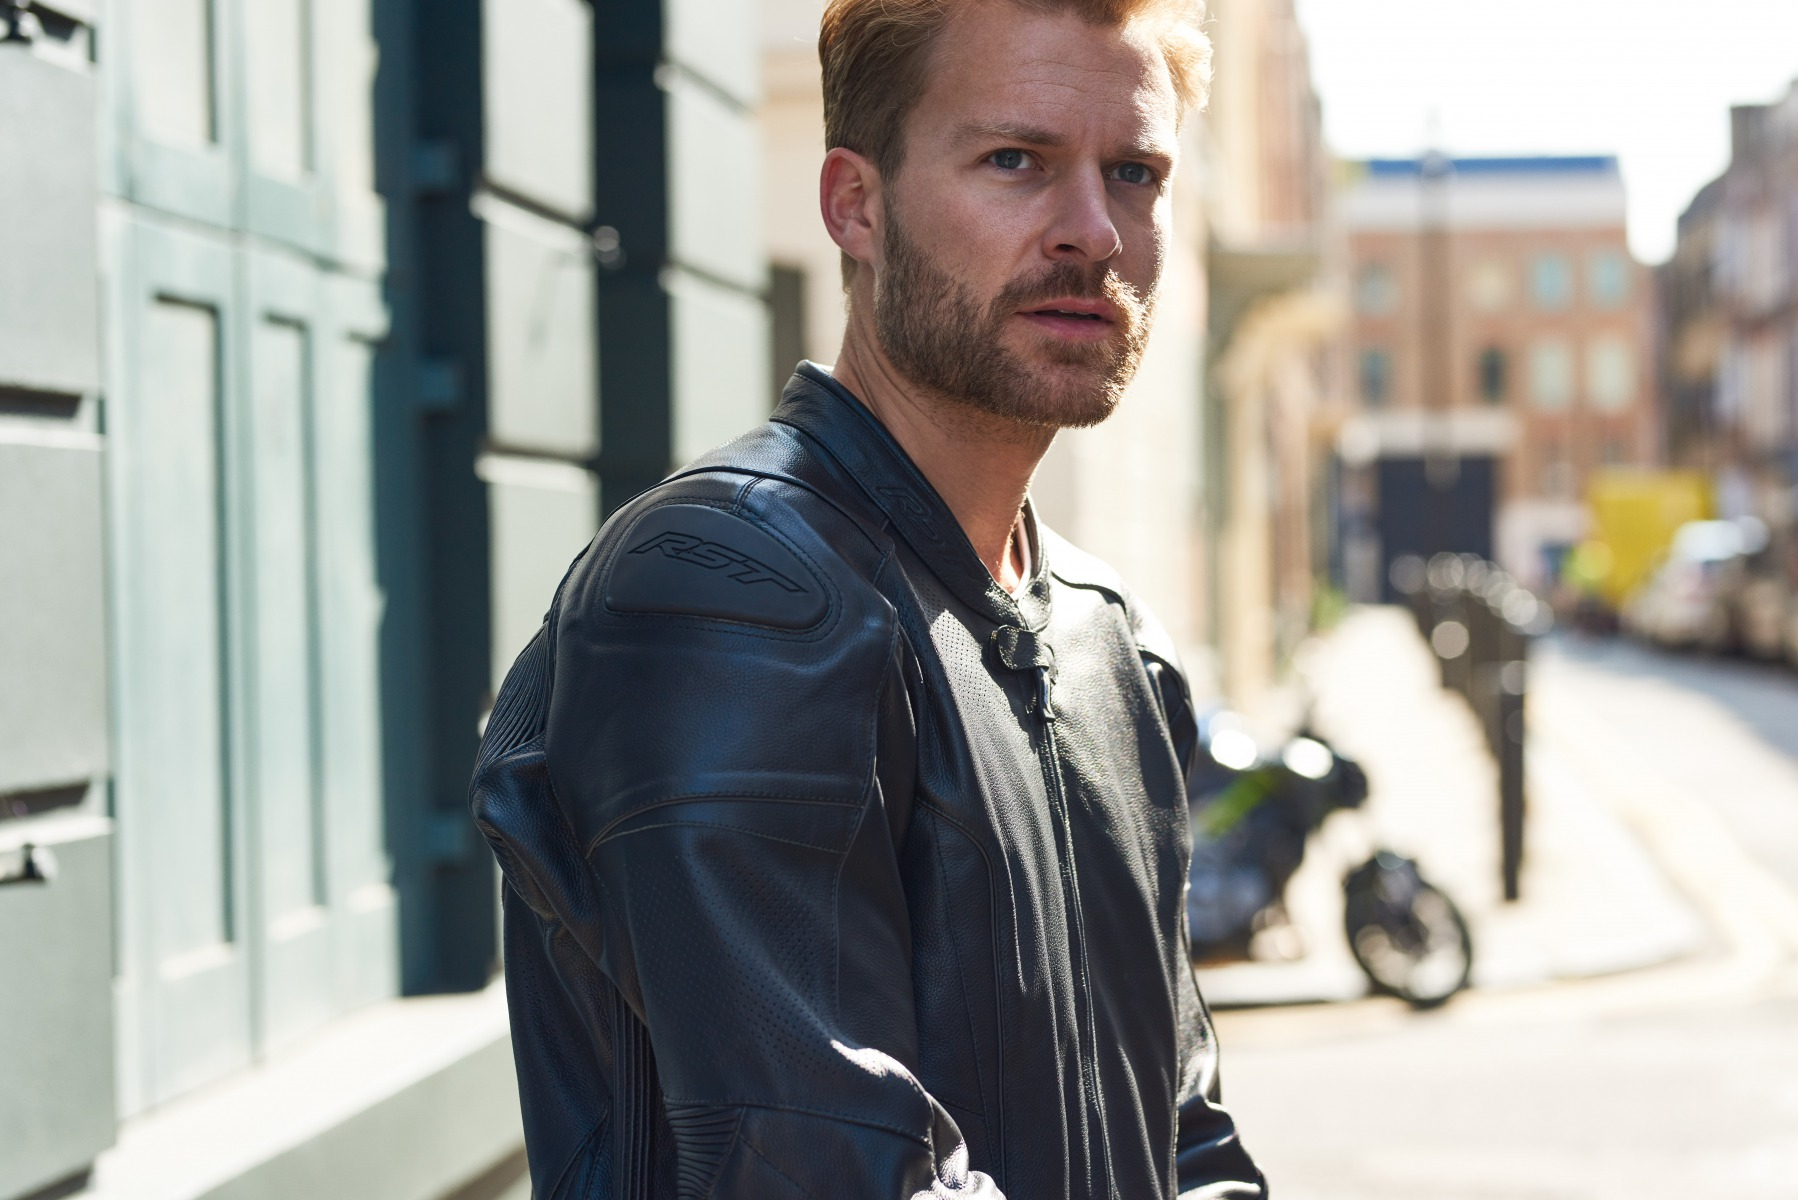 102190-rst-gt-leather-jacket-black-lifestyle-02